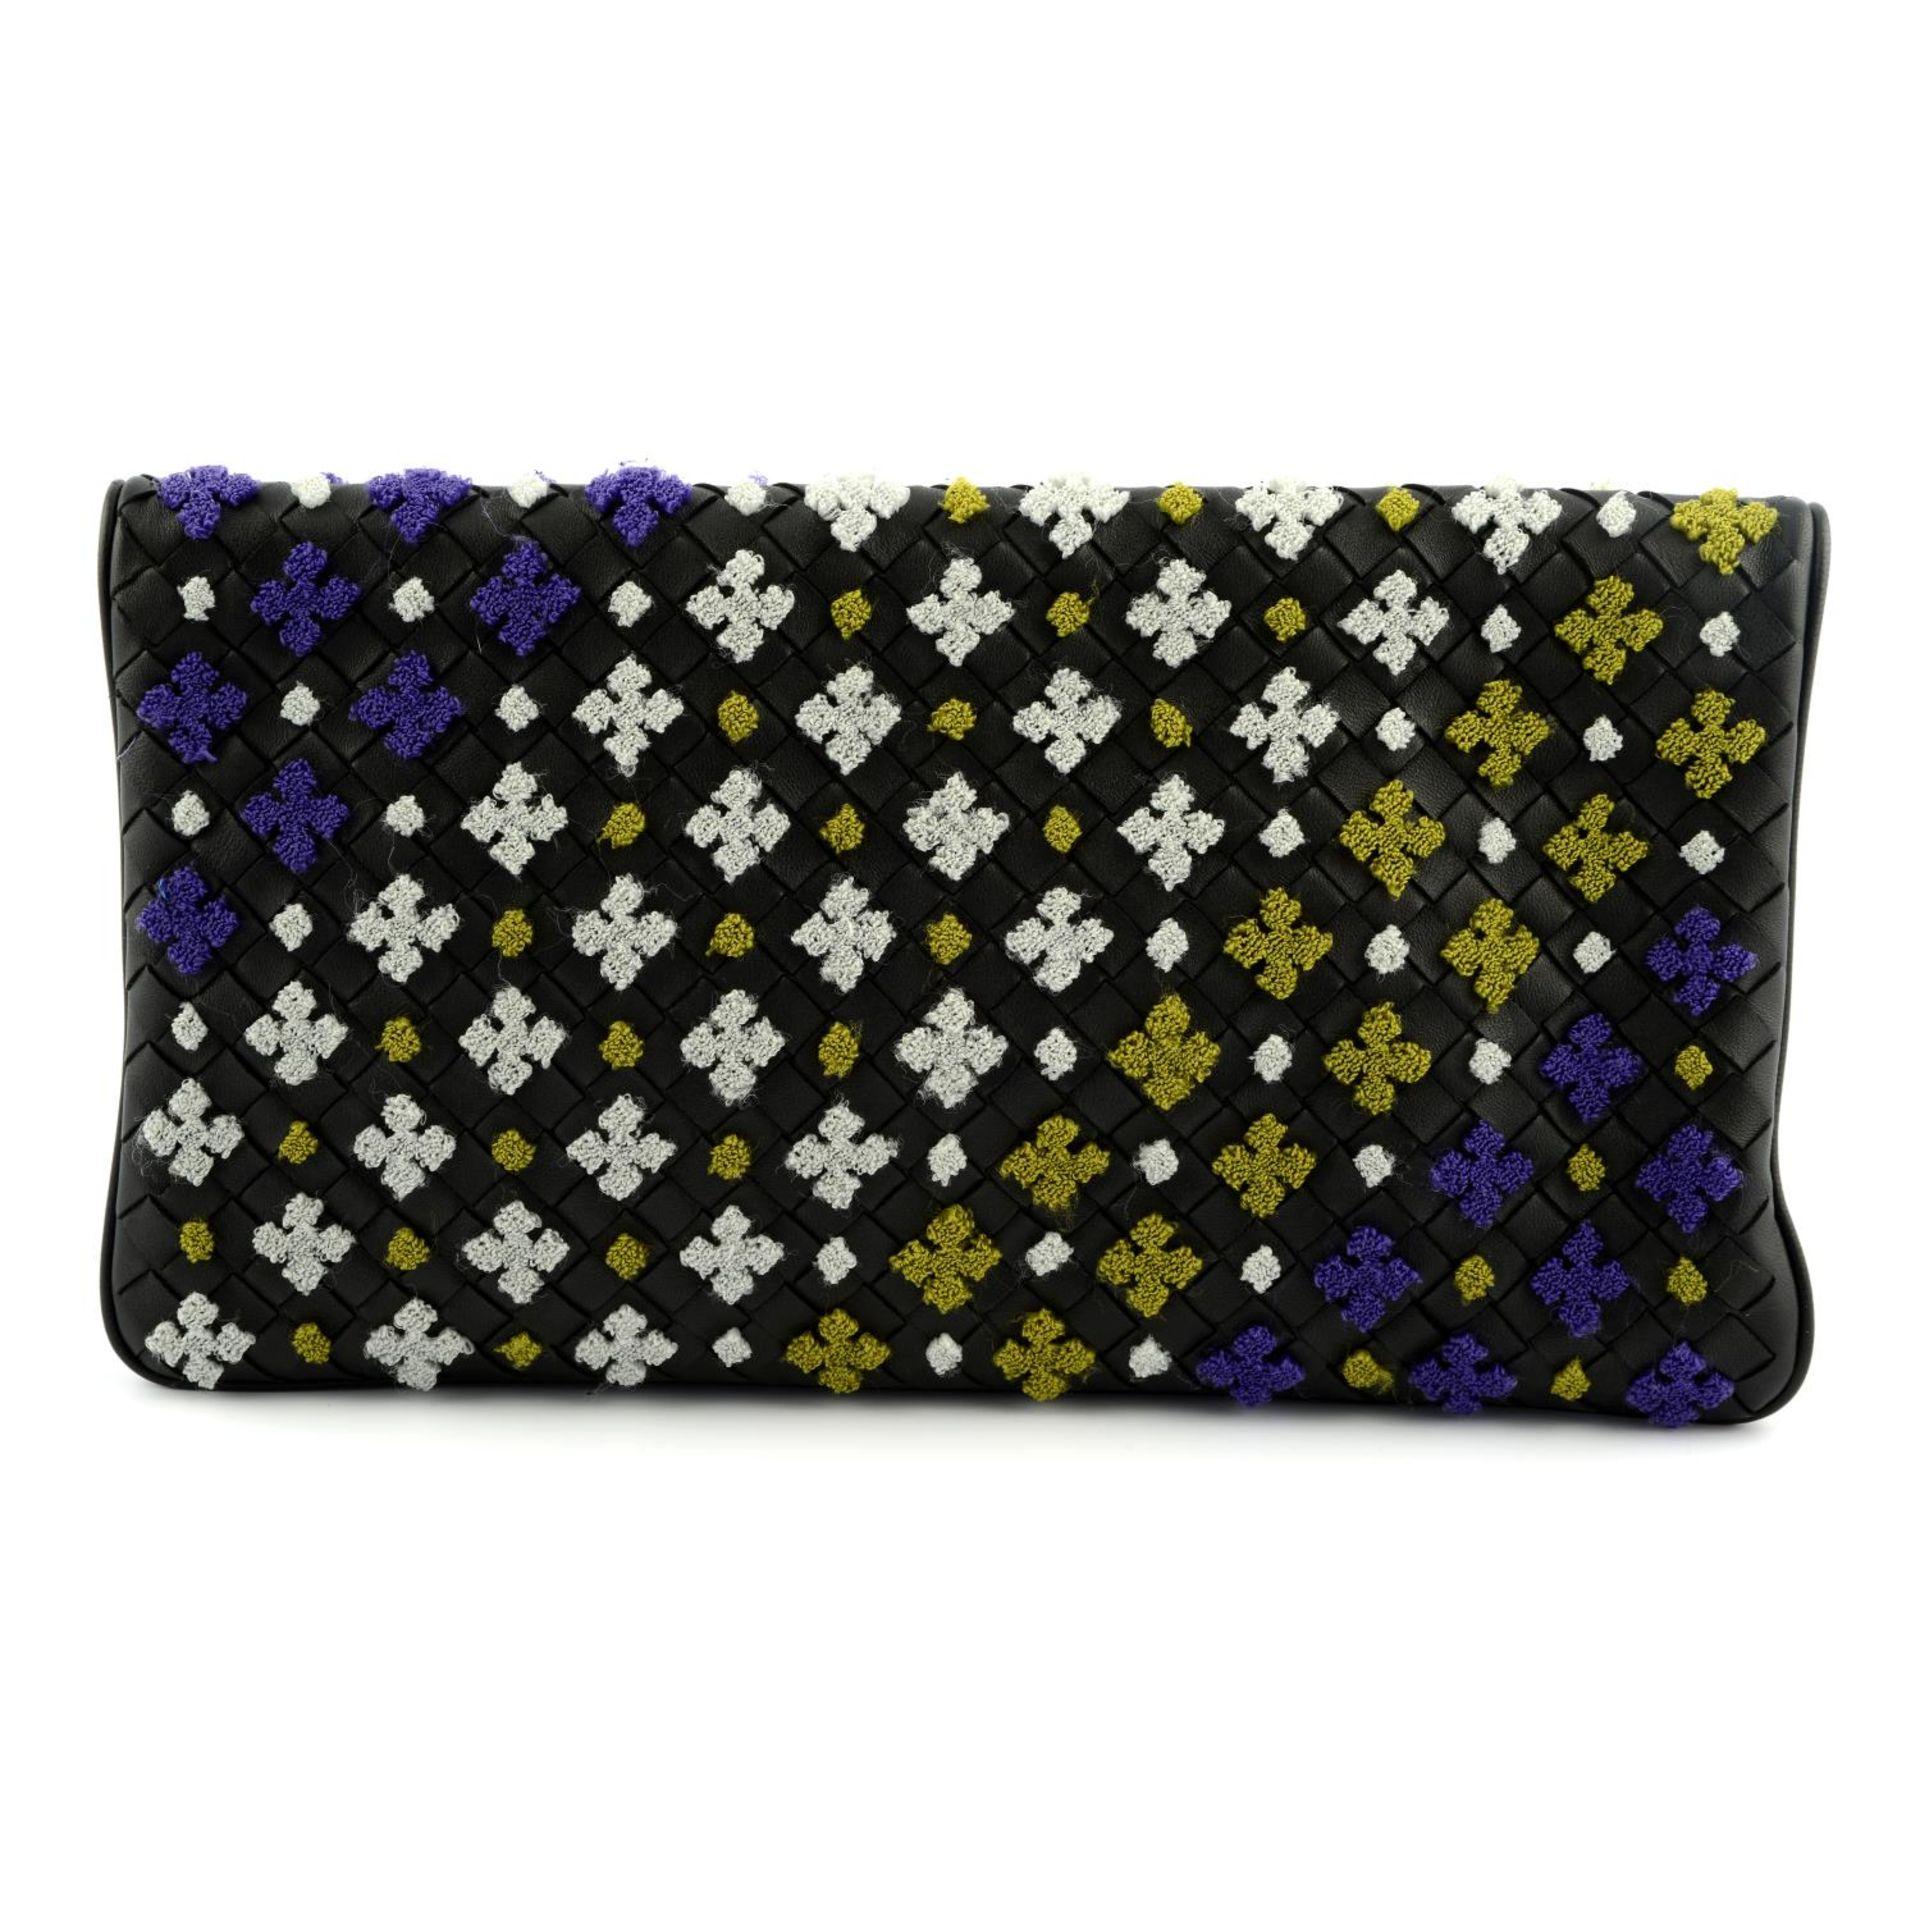 BOTTEGA VENETA - a Nero multicolour embroidered clutch. - Image 2 of 5